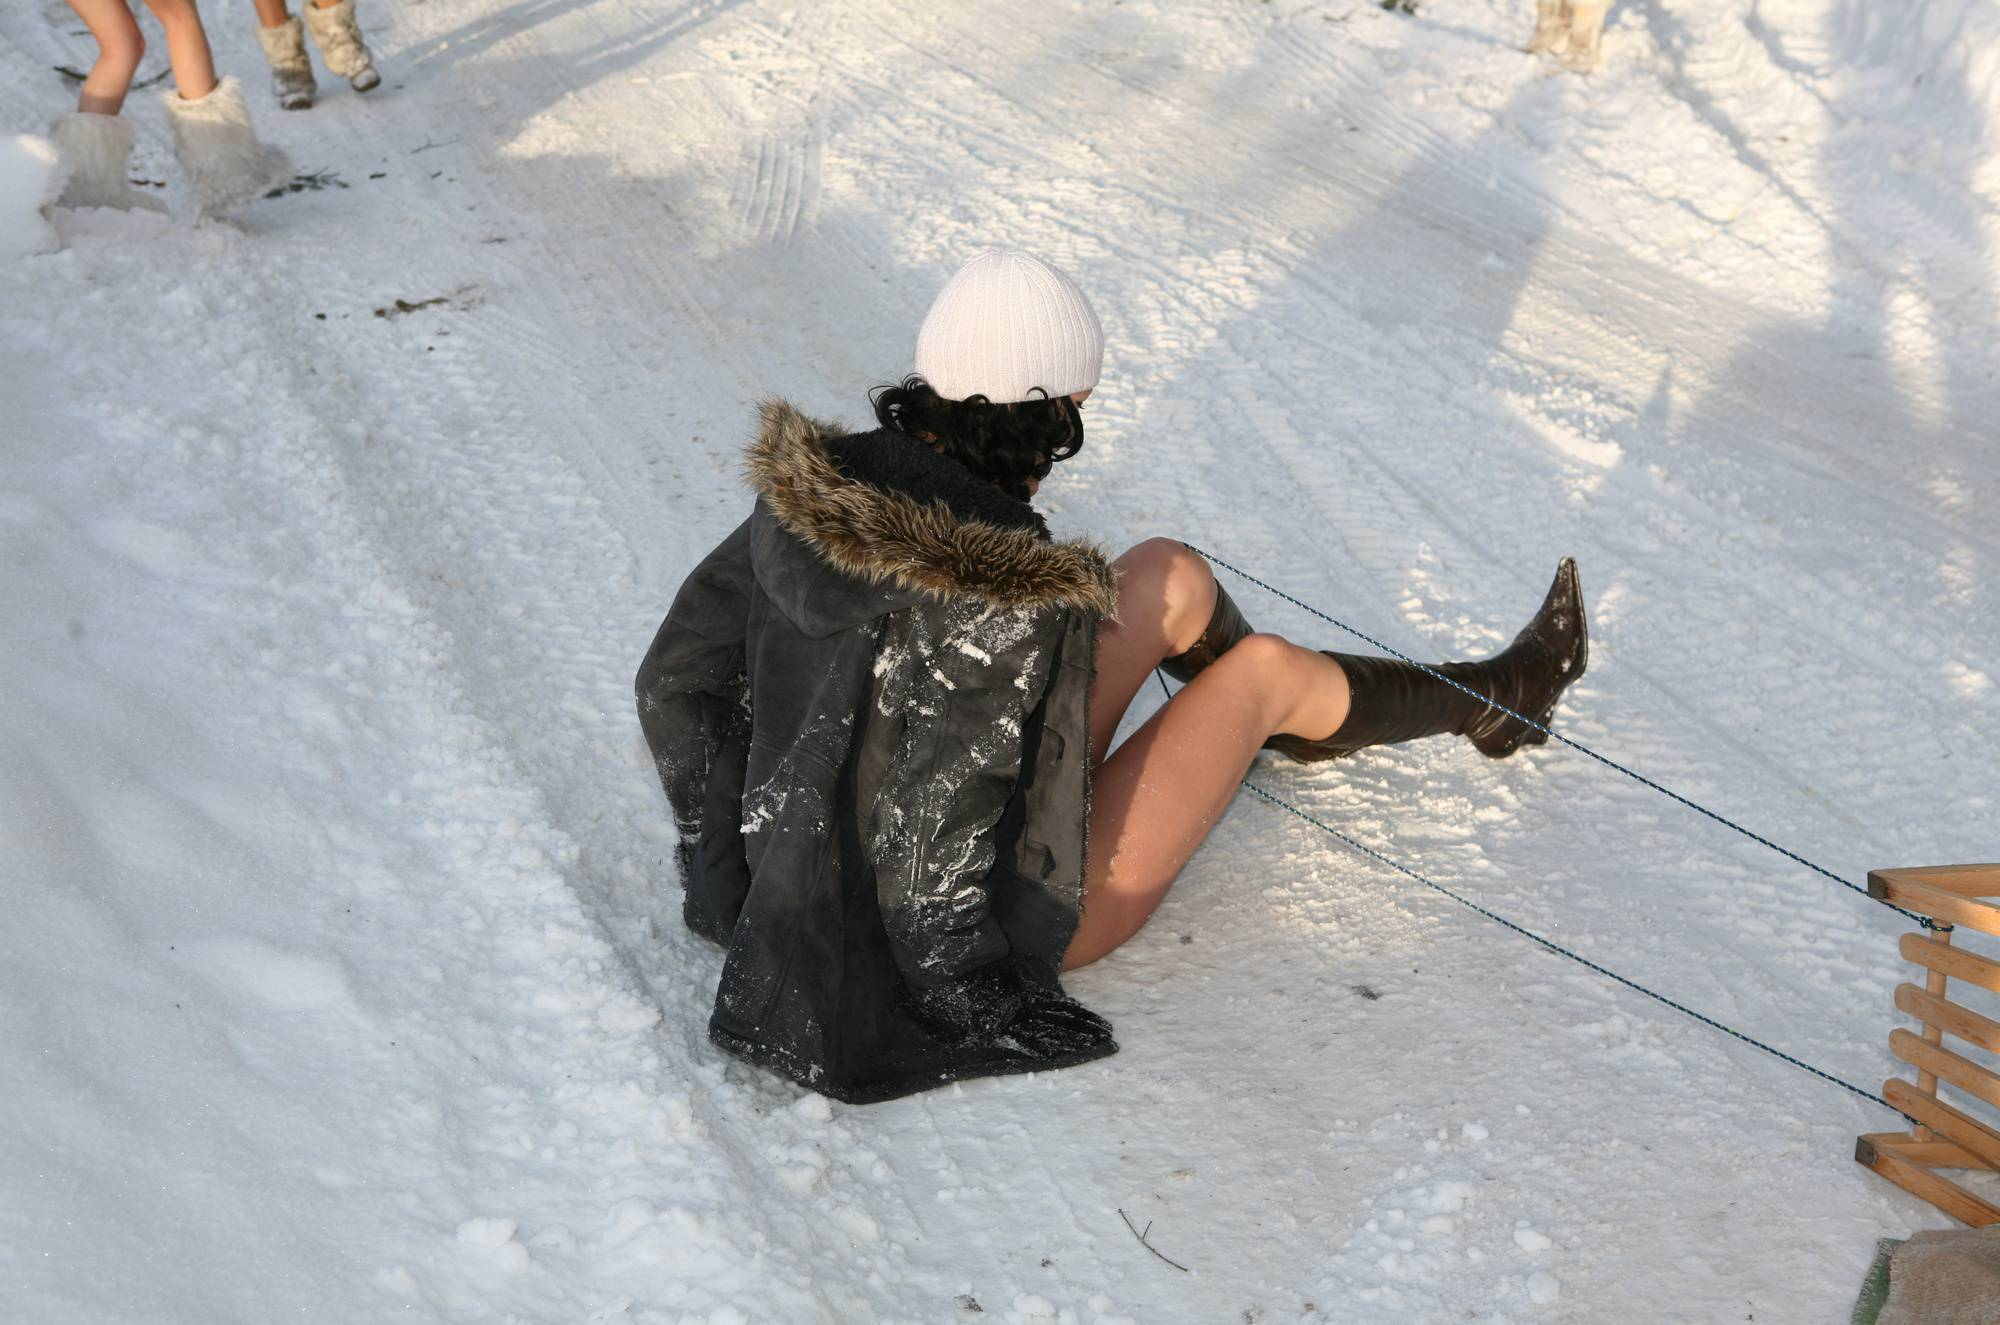 Purenudism Photos-Snow Day Couple's Sled - 2